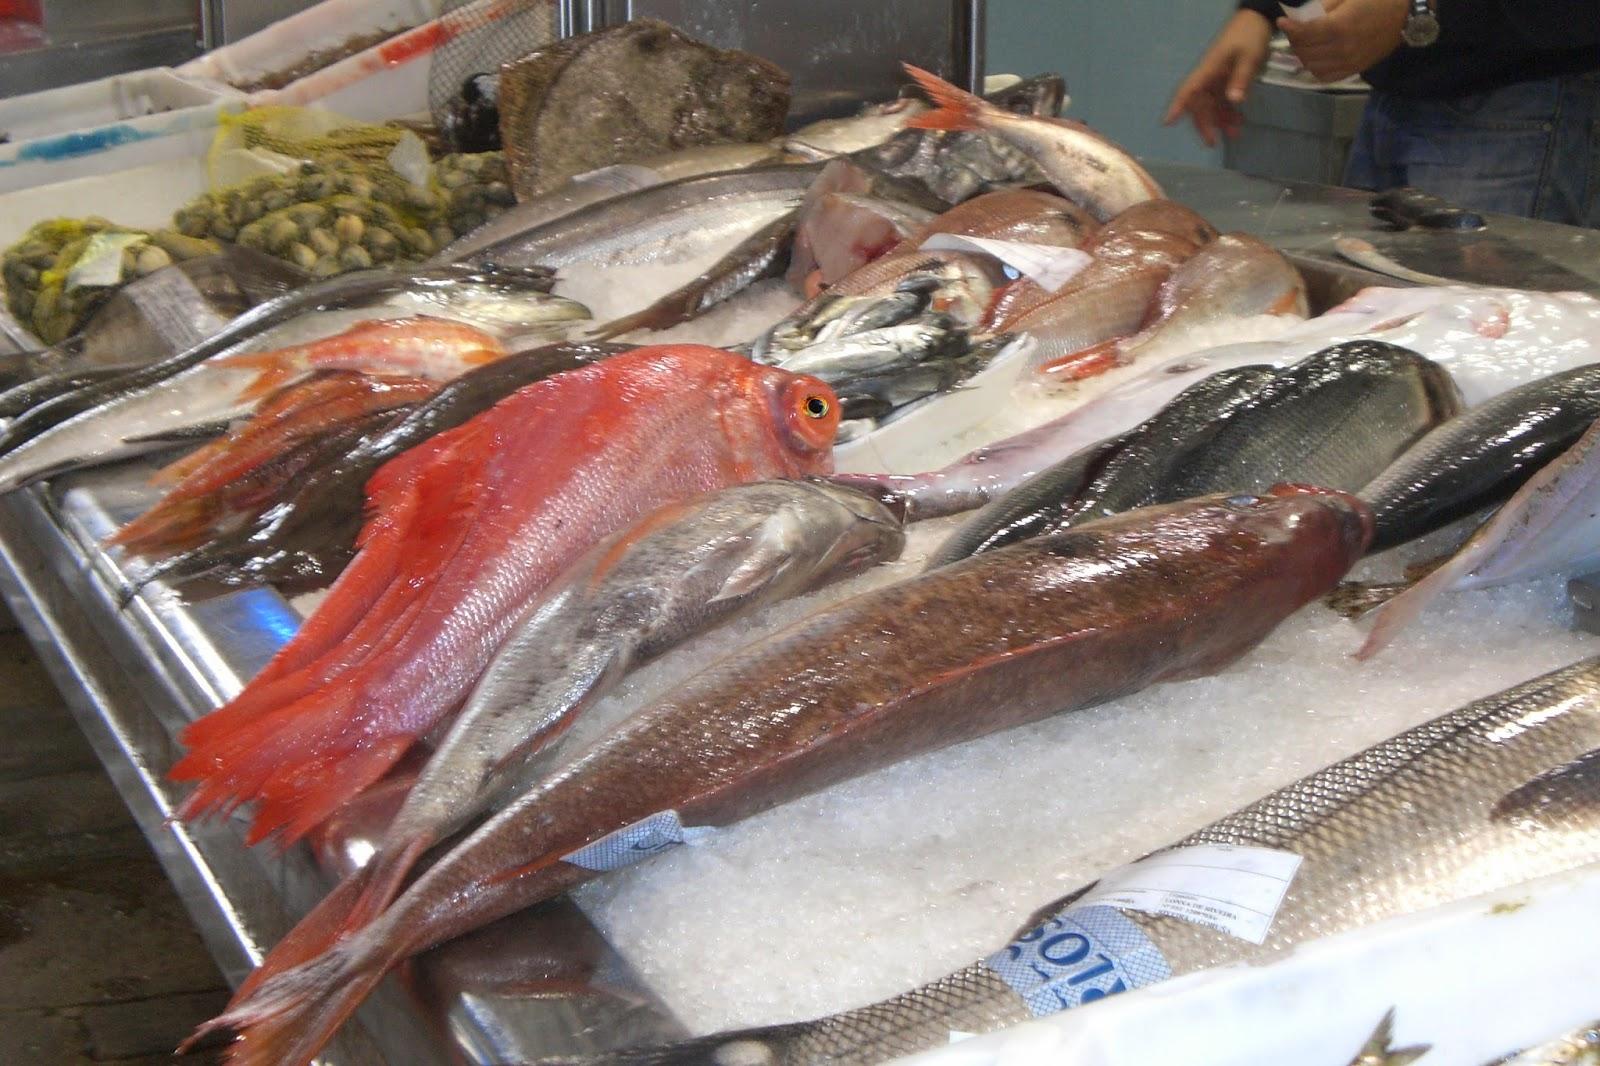 Santiago de Compostela market has a fantastic fish section